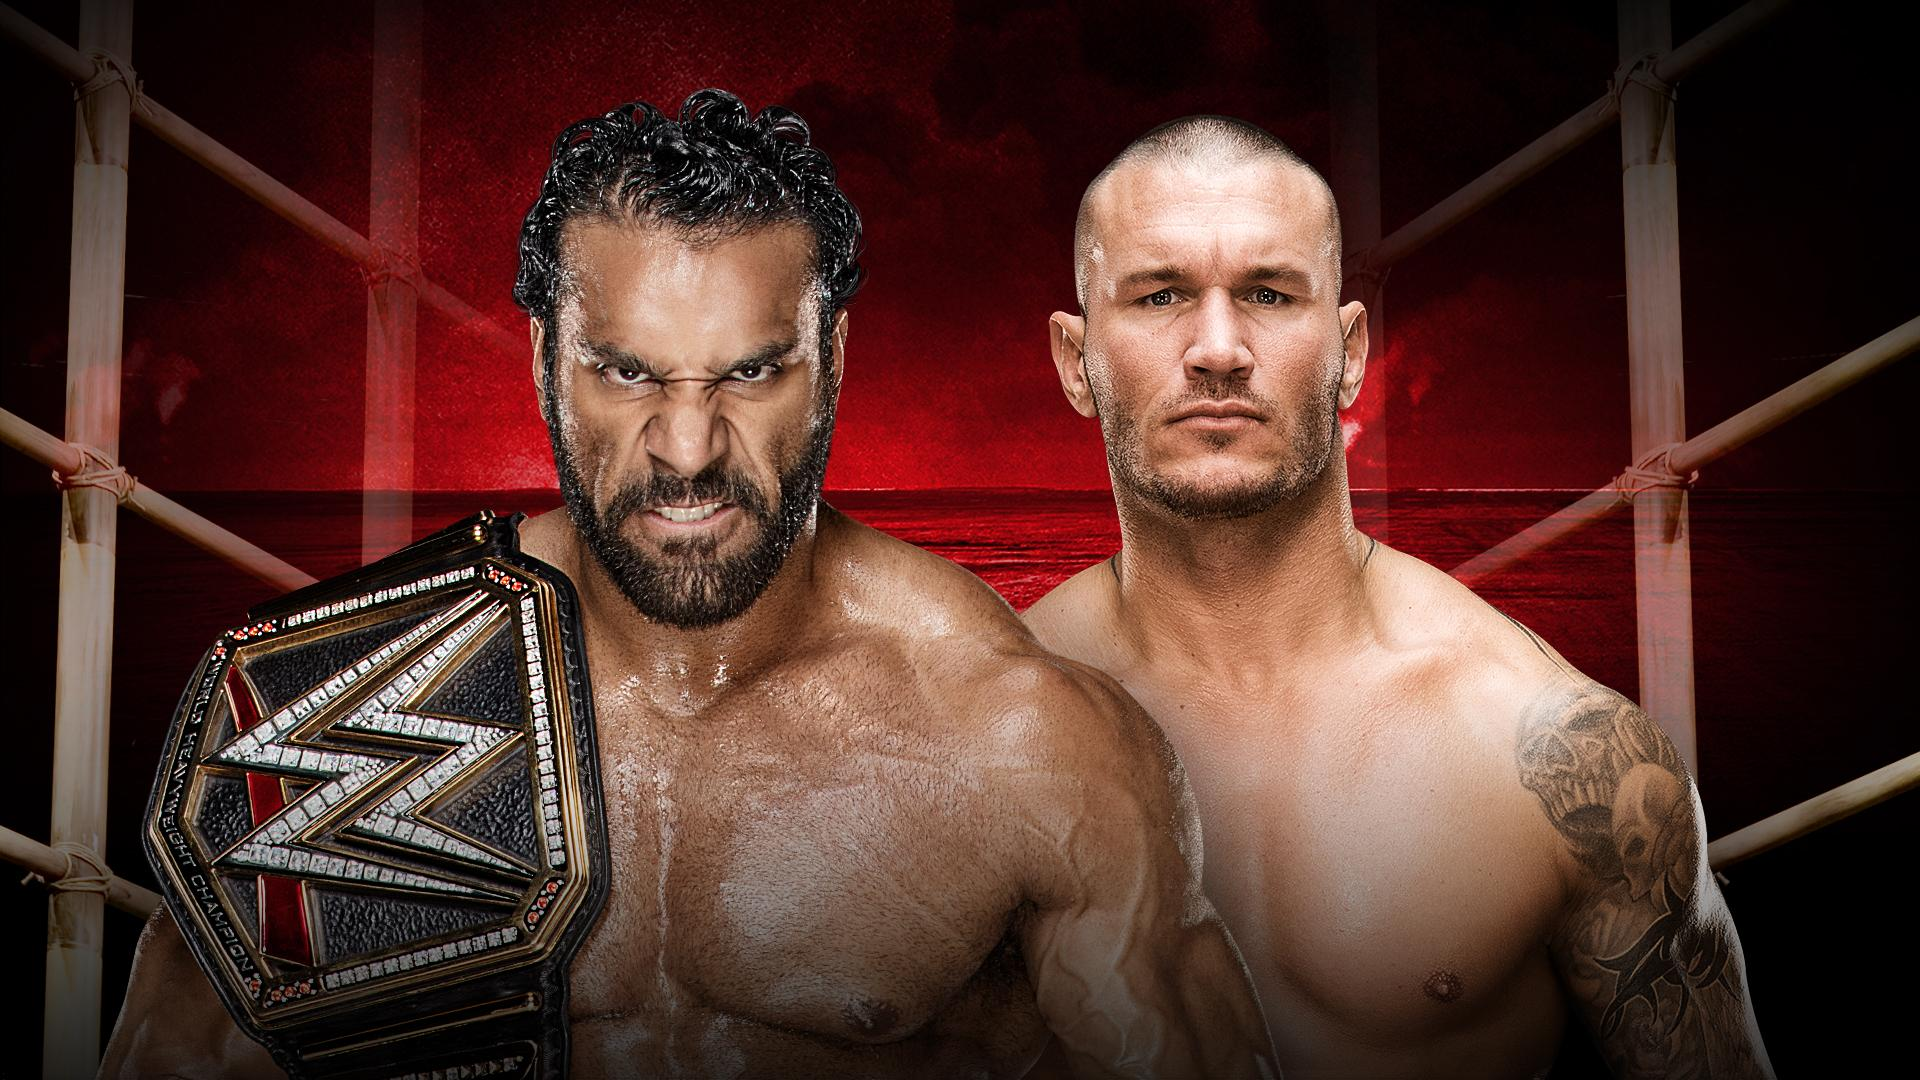 WWE Champion Jinder Mahal and Randy Orton